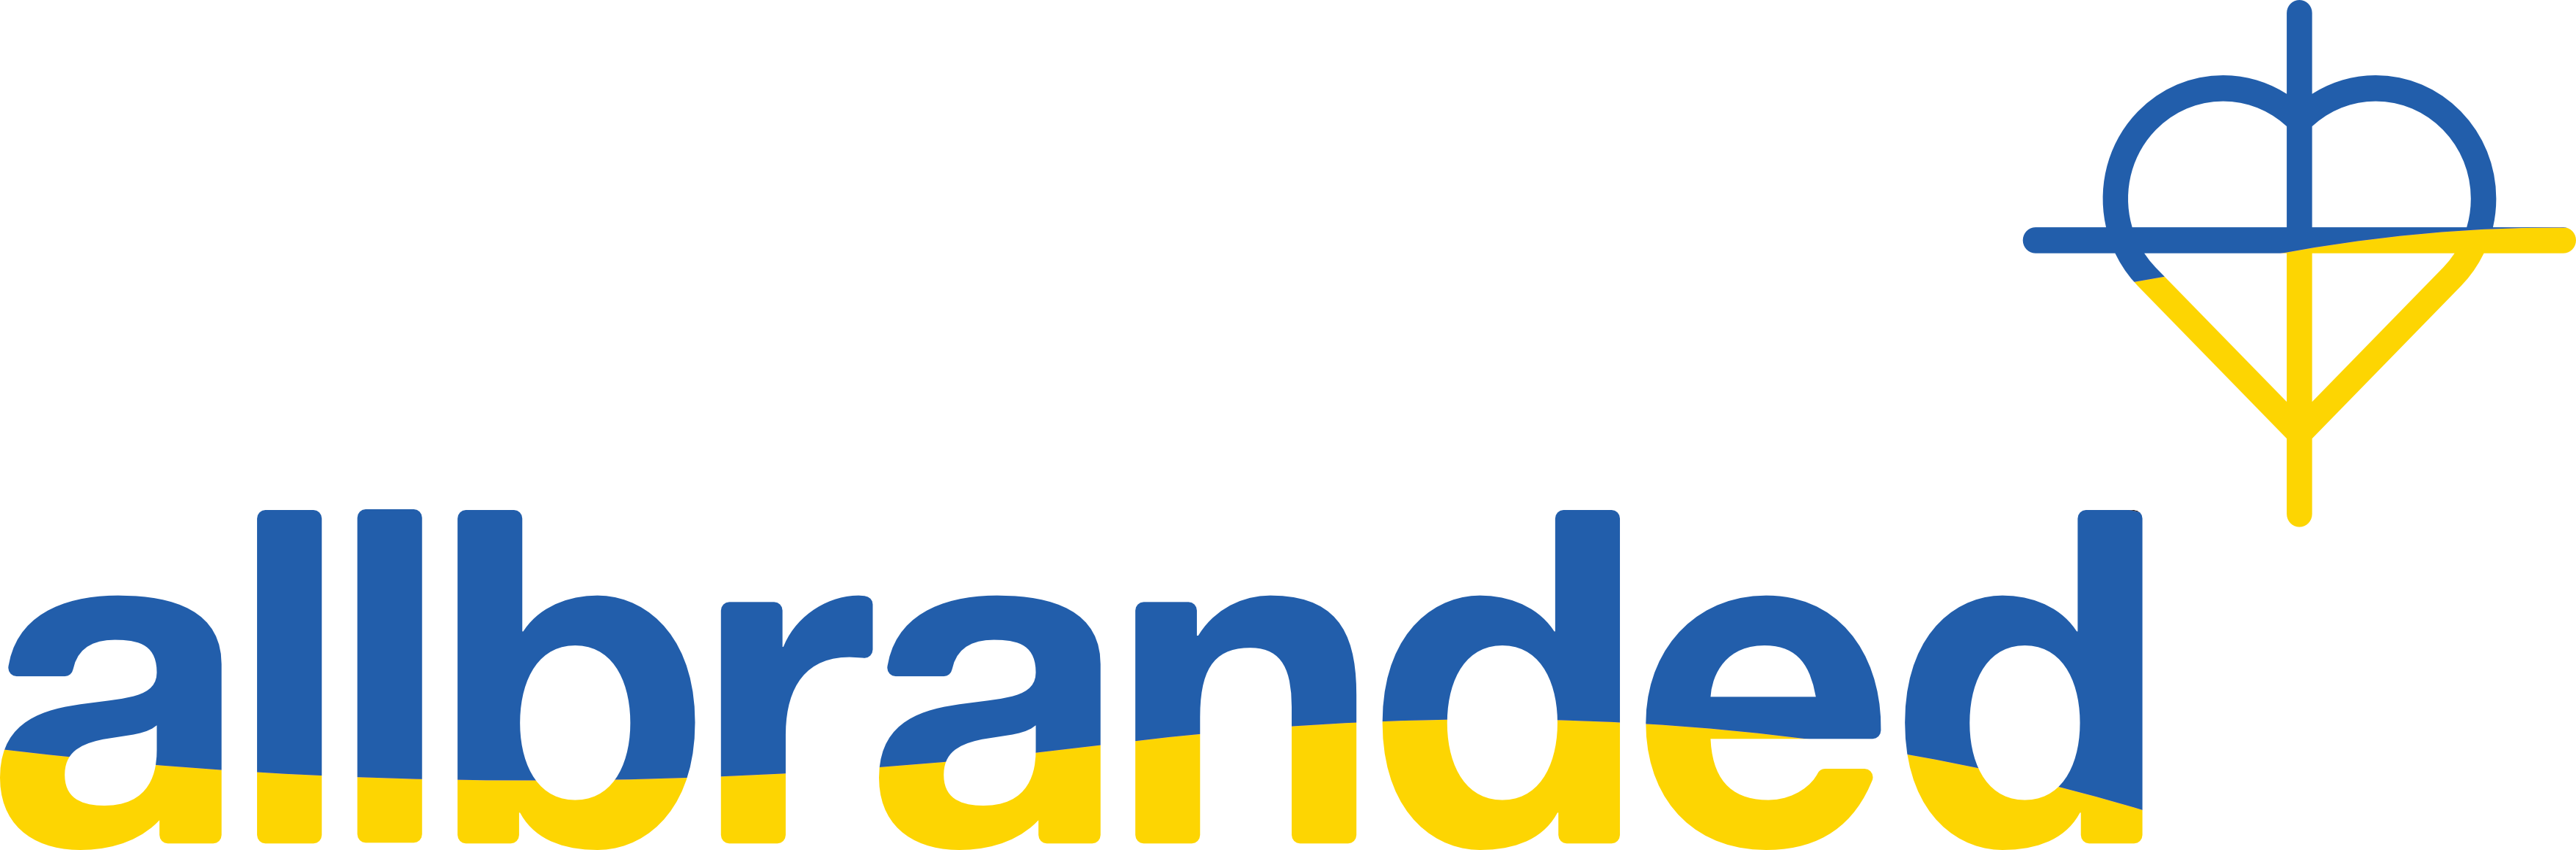 Werbeartikel - Werbemittel - Werbegeschenke | allbranded Online Shop